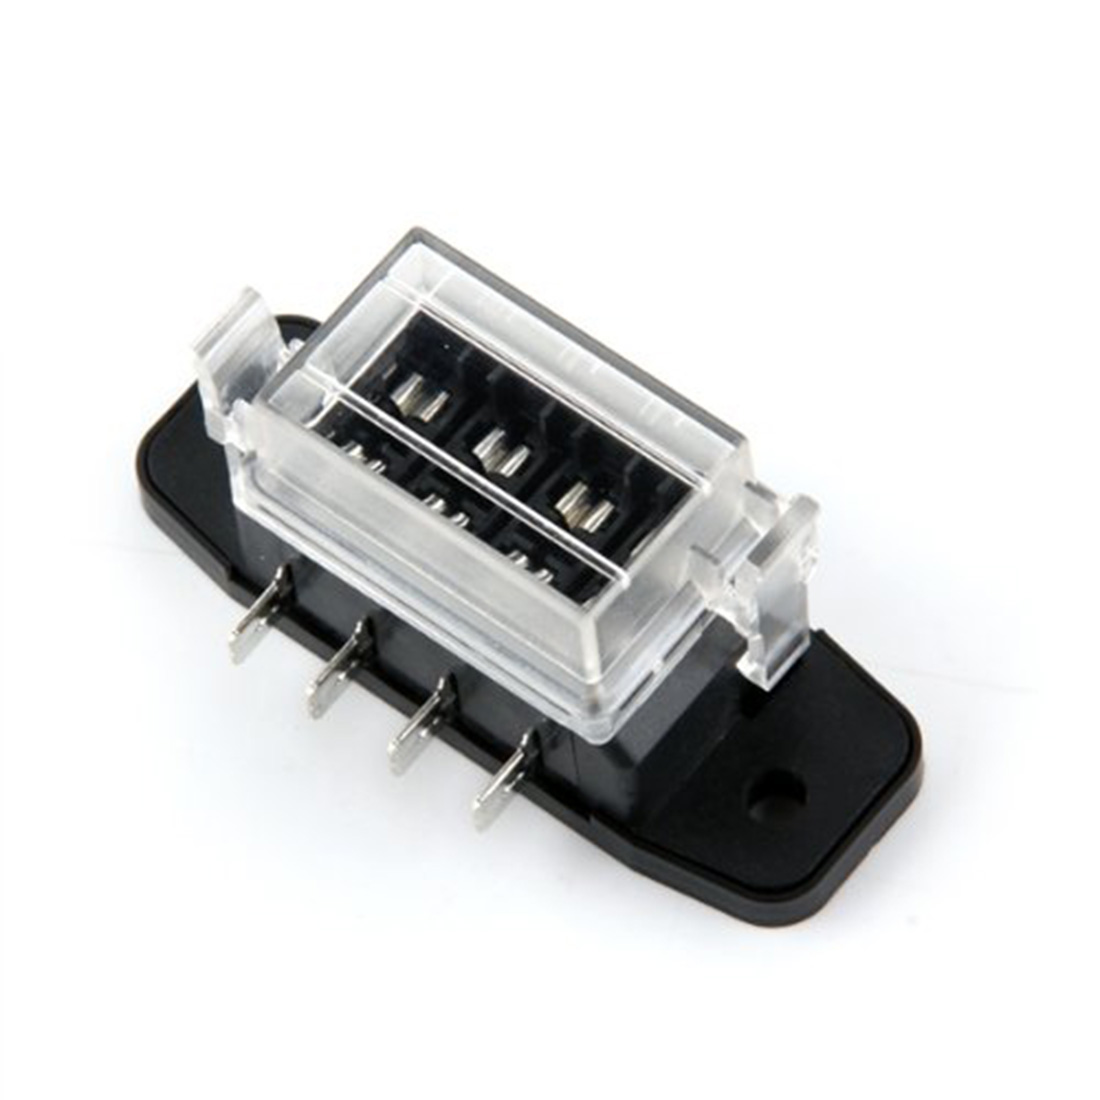 dewtreetali new 4 way circuit car automotive atc ato blade fuse box block holder fuseholder 32v [ 1100 x 1100 Pixel ]